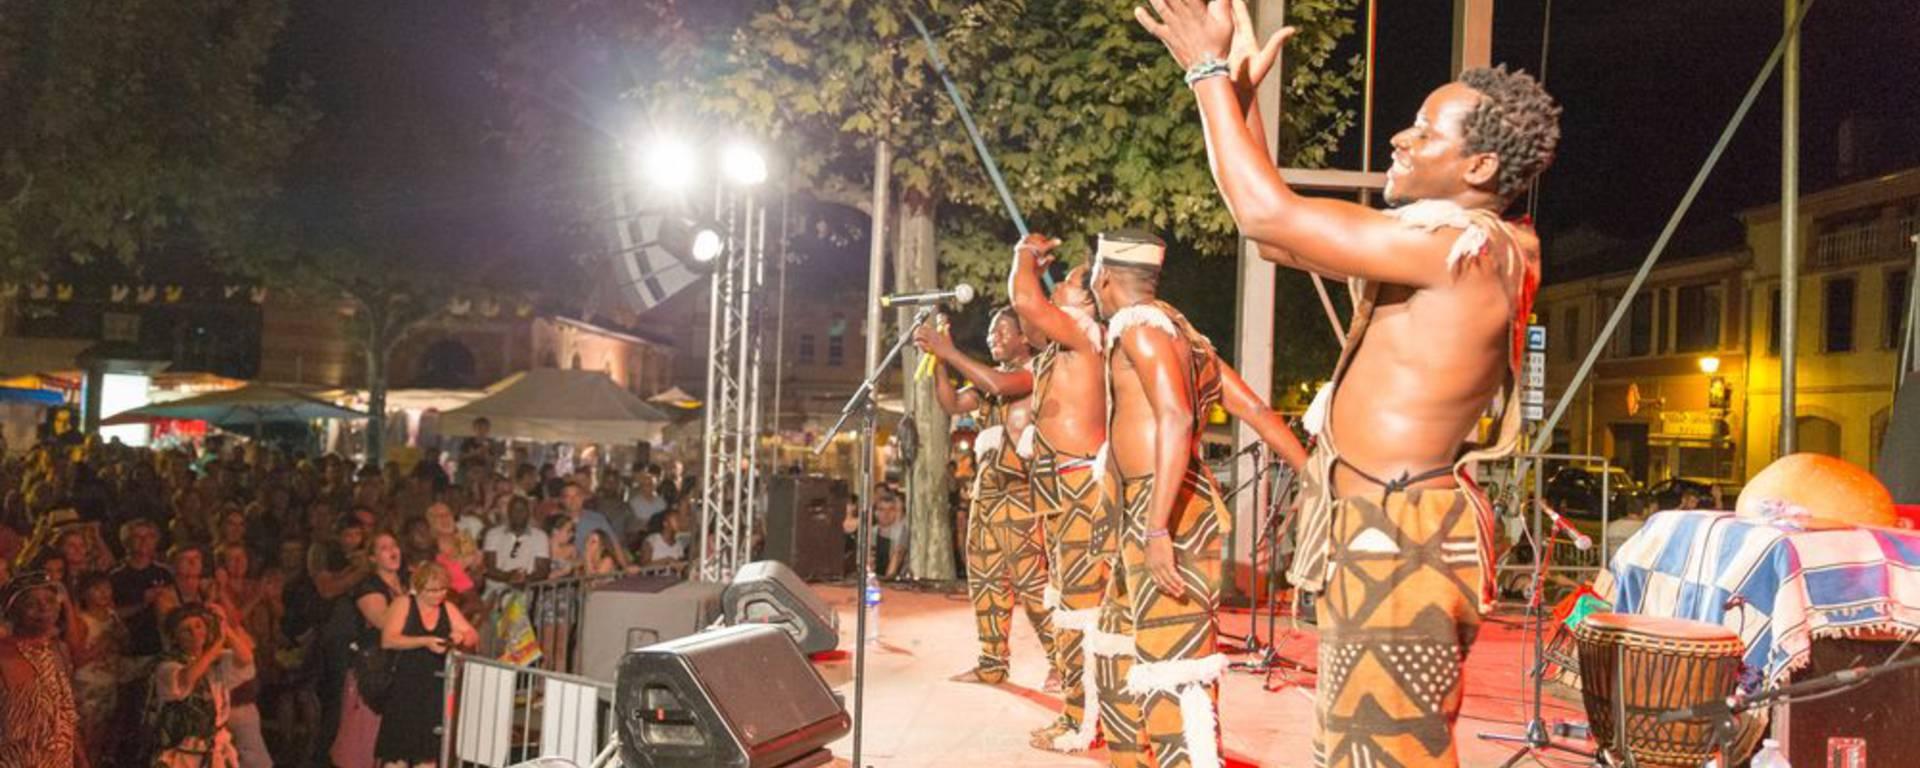 Festival Sam'Africa, Samatan, Lombez, Savès, Gers, Gascogne, France